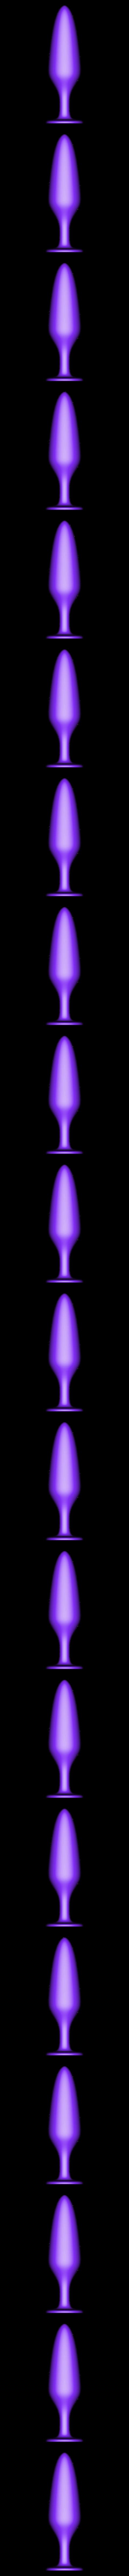 Bplug1.stl Download STL file A plug • 3D printing object, Naughty